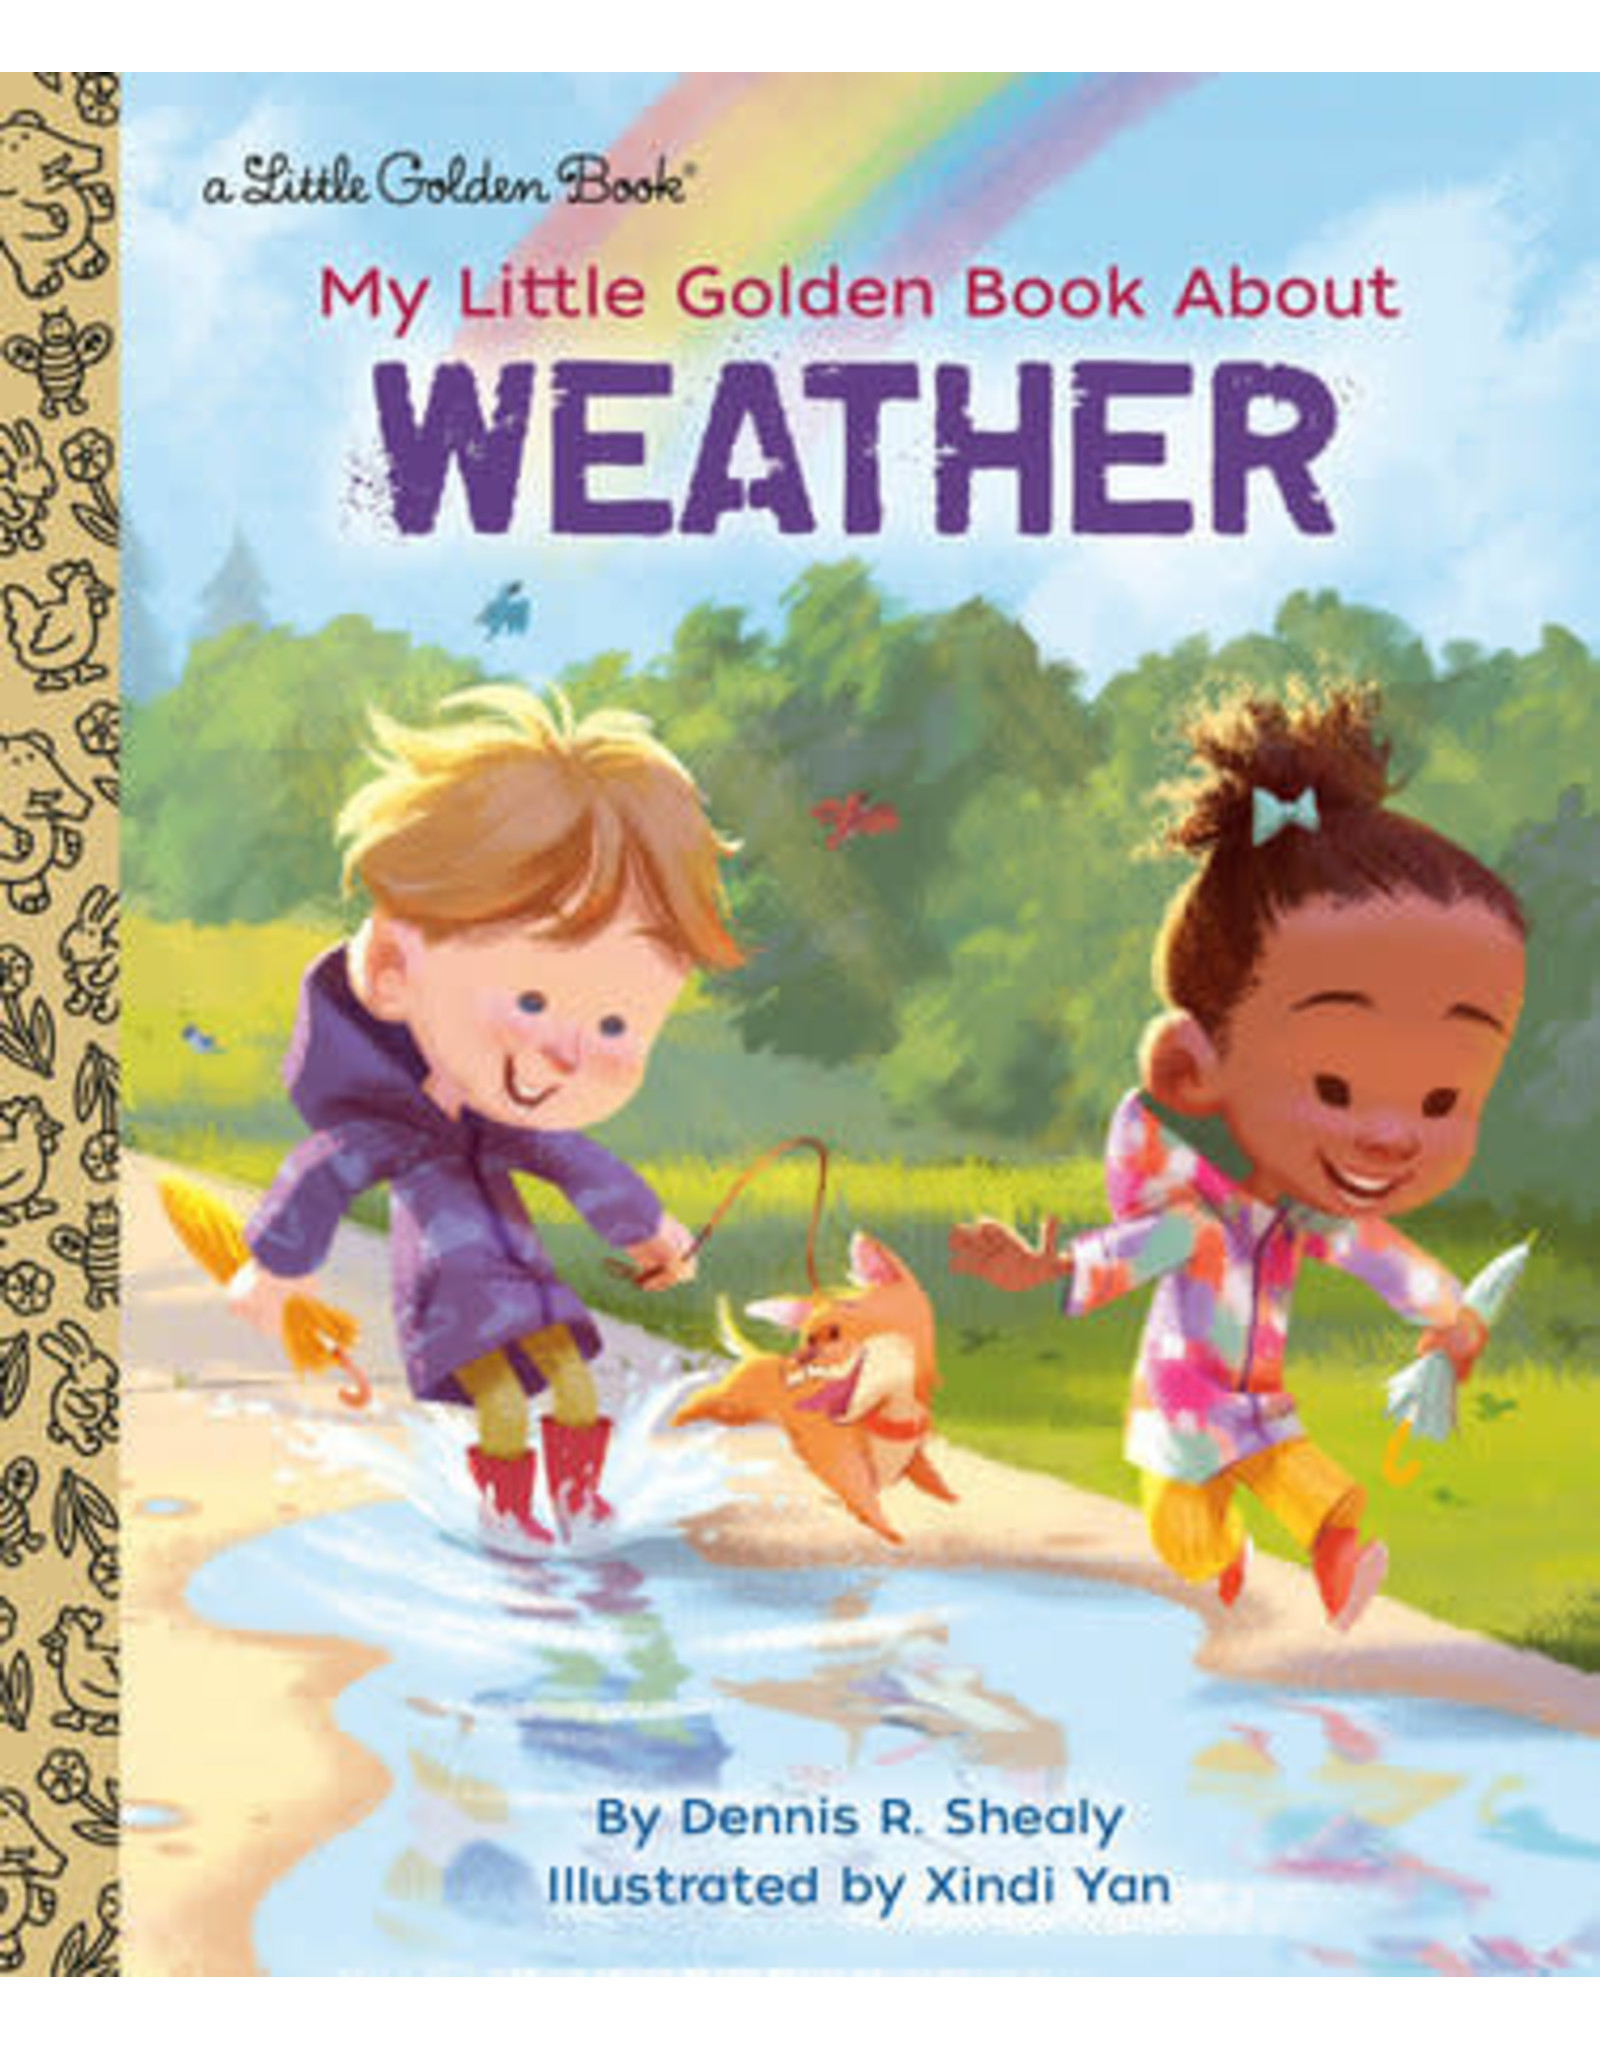 Little Golden Books My Little Golden Book About Weather